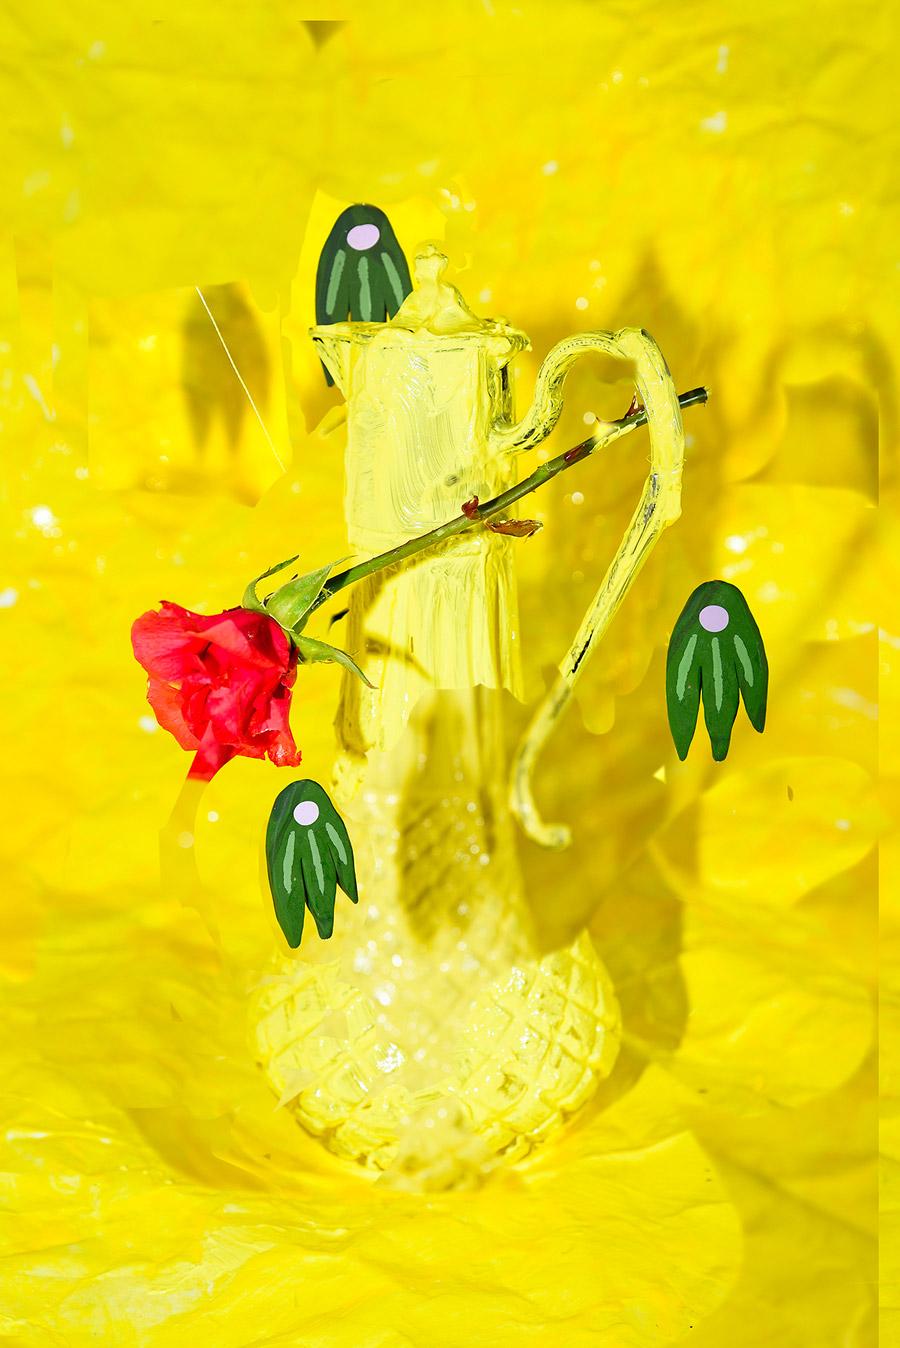 «Надика», © Эммалин Занелли / Emmaline Zanelli, Аделаида, Австралия, Финалист категории «Коммерческая / Редакционная», Фотоконкурс натюрморта «Объекты желания» — Objects of Desire